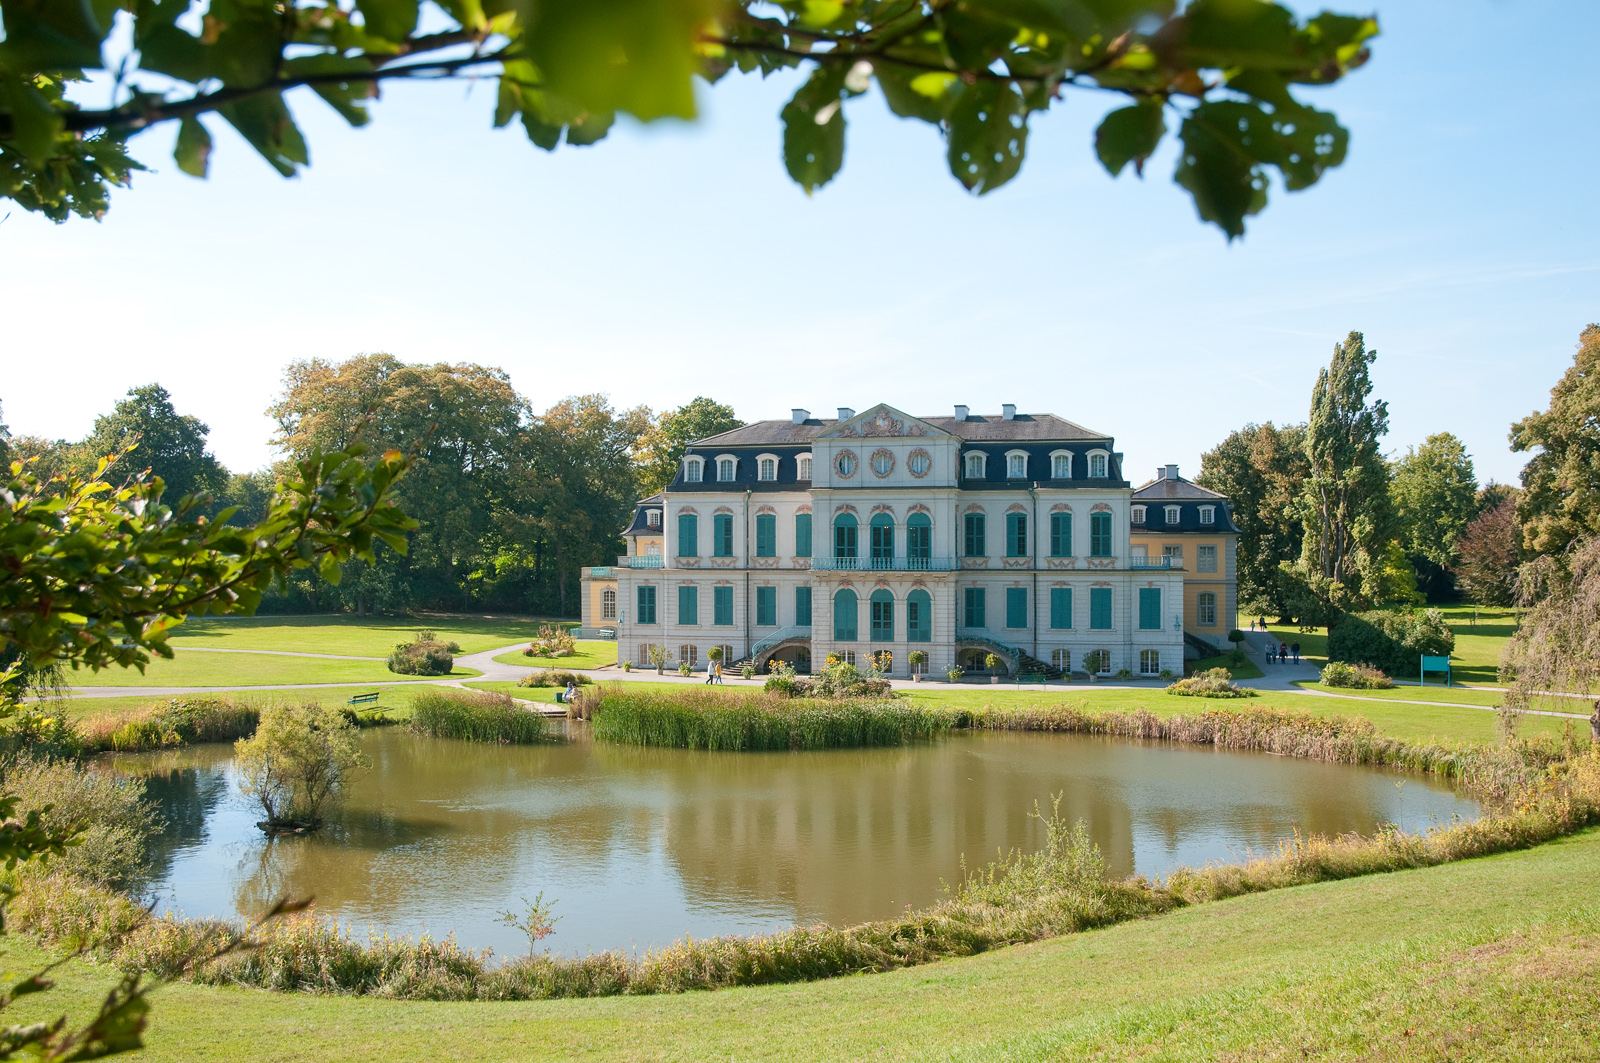 Schloss Wilhelmstal, nahe Kassel/Calden